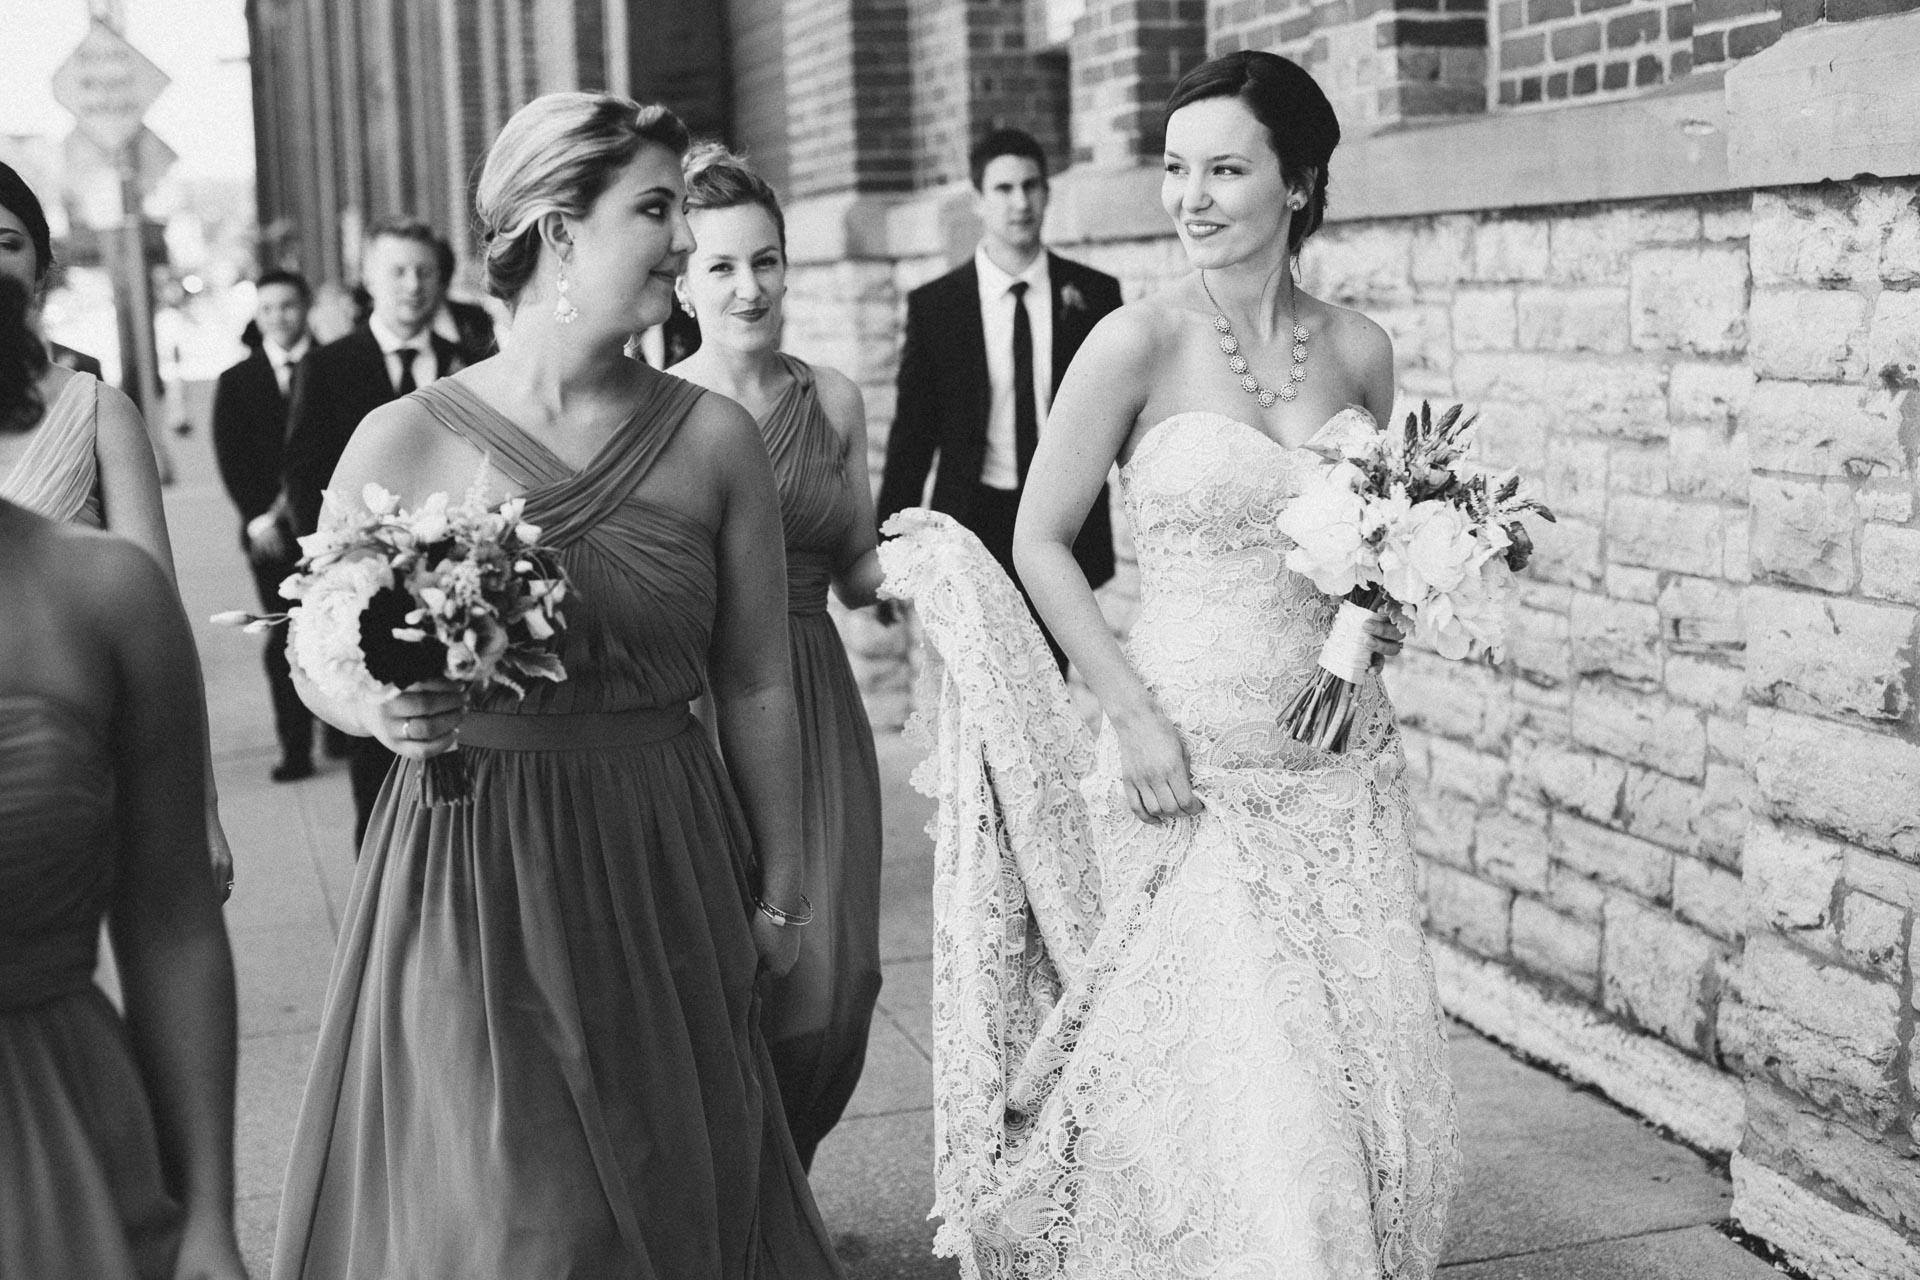 Julia-Michael-Cincinnati-Music-Hall-Wedding-055@2x.jpg